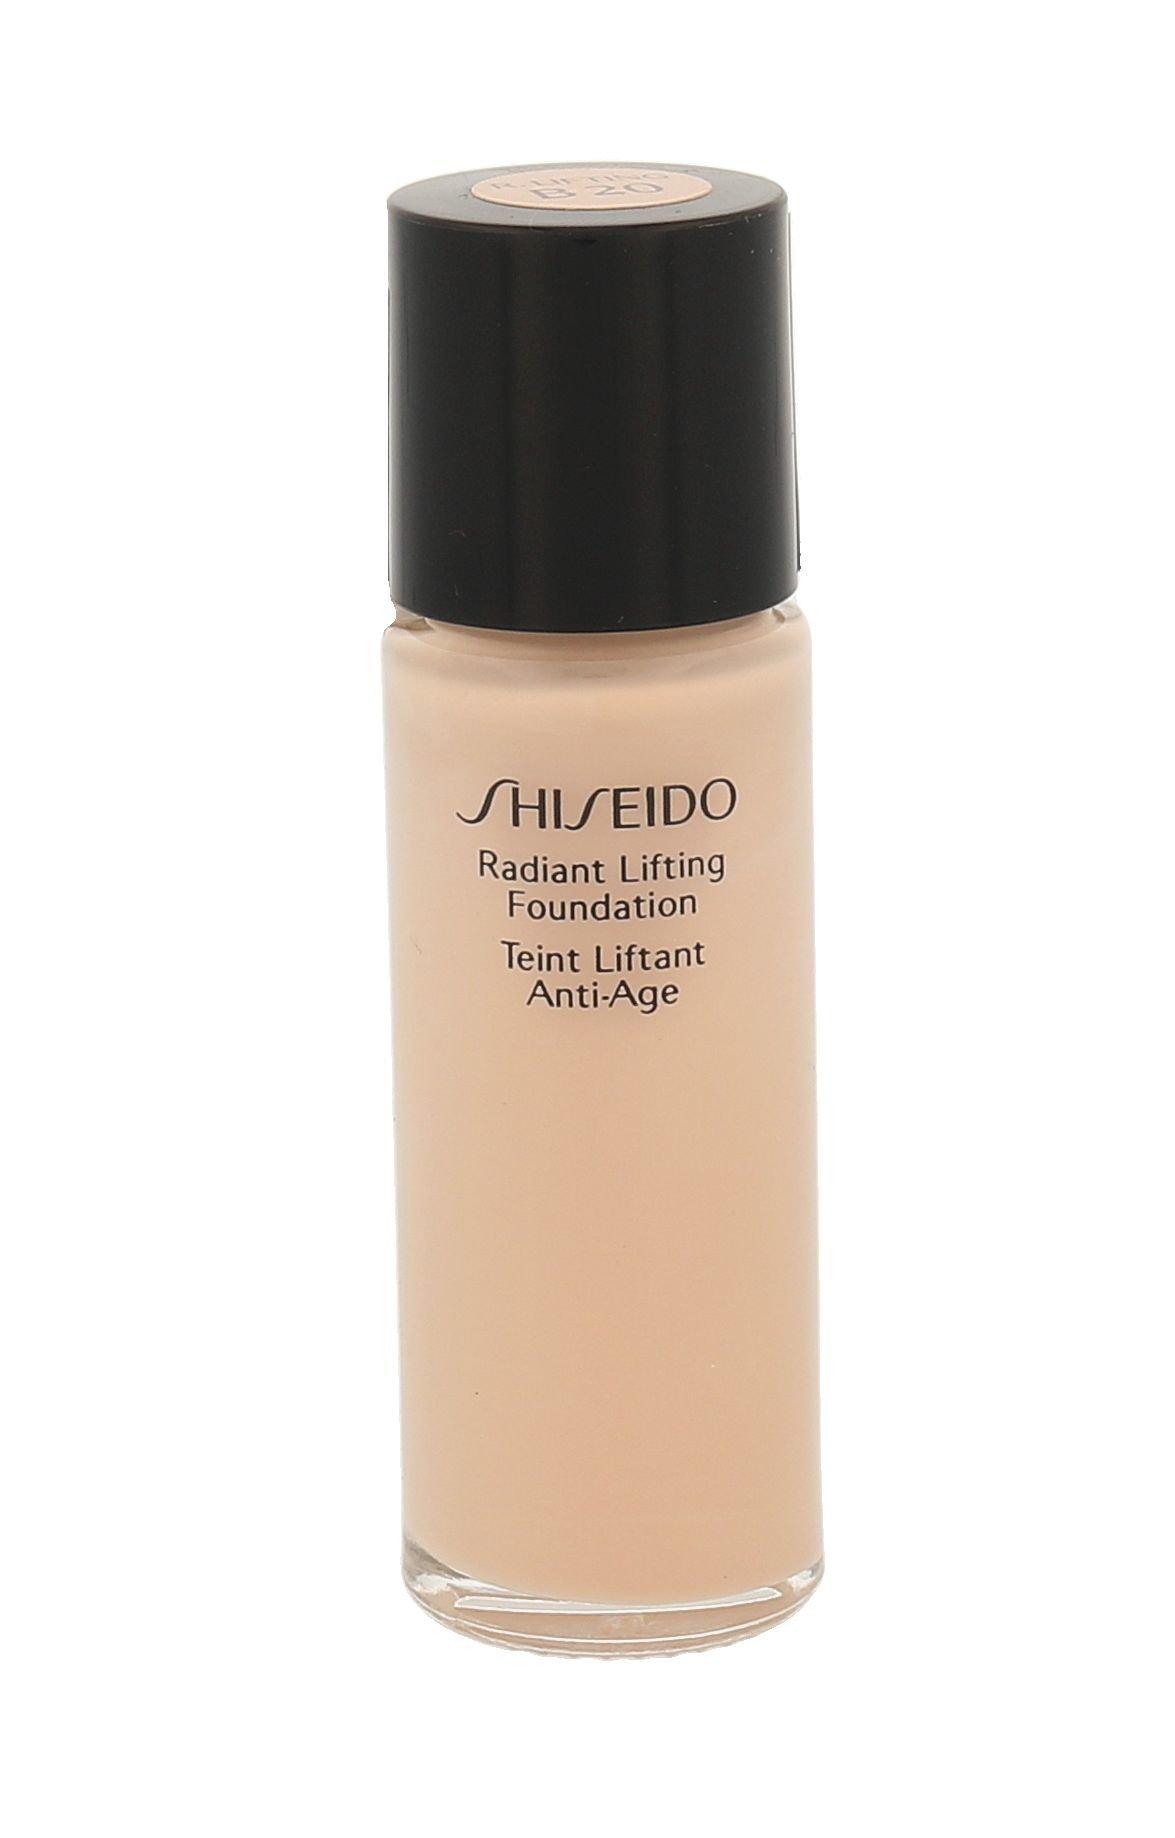 Shiseido Radiant Lifting Foundation Cosmetic 15ml B20 Natural Light Beige